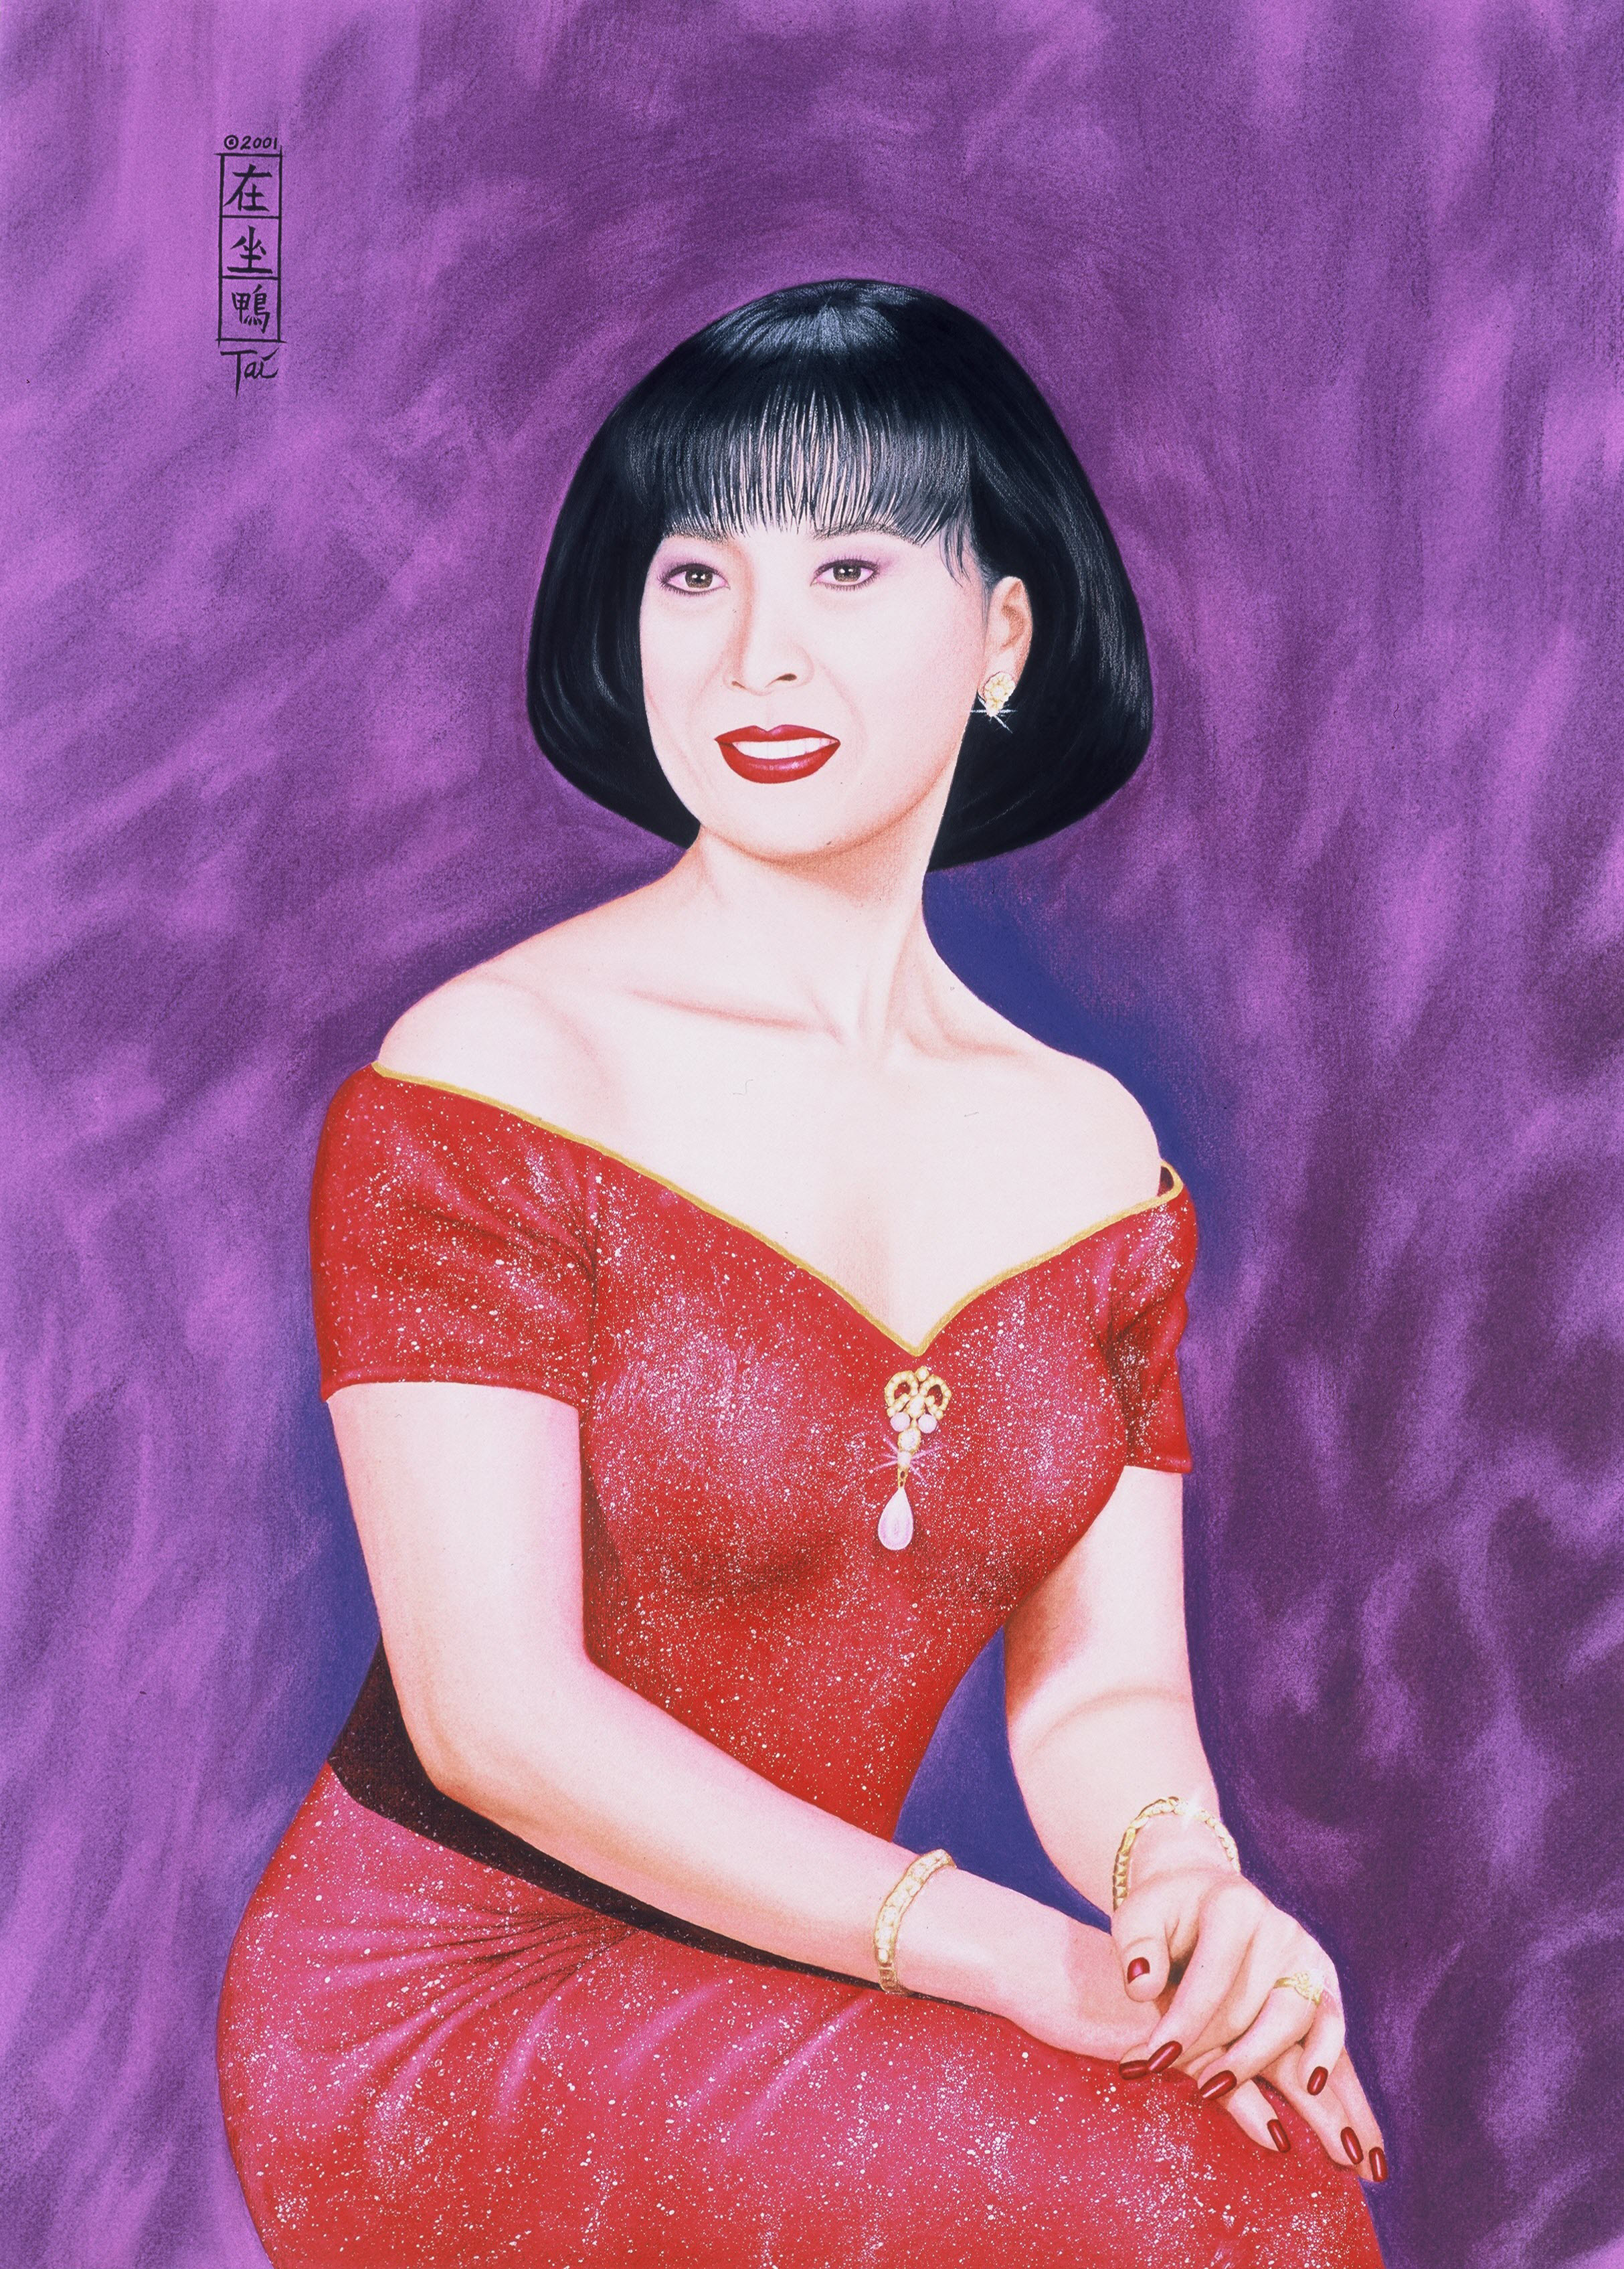 Artist Hangout 32 - Lady In Red (2001 Dec) - (mixed media) By Artist Tai Zen